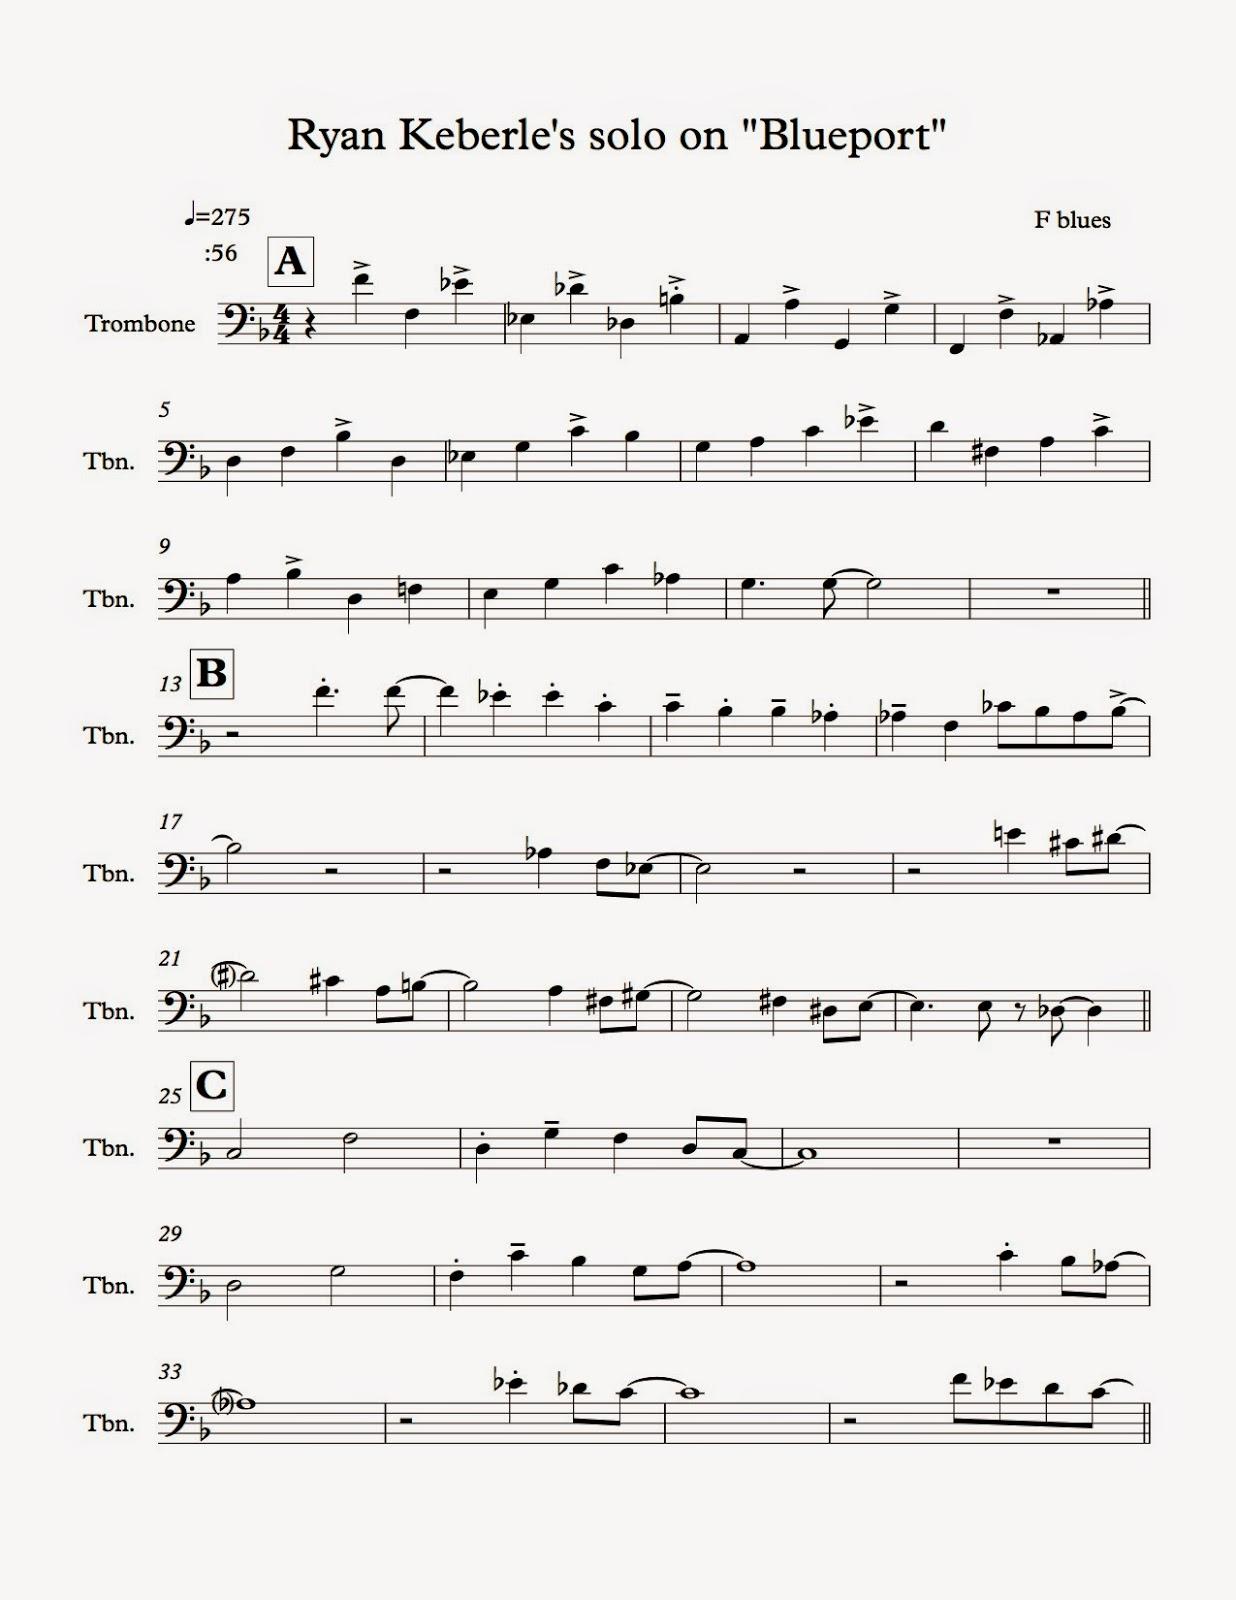 Wits Untied : Trombone Transcription I: Ryan Keberle